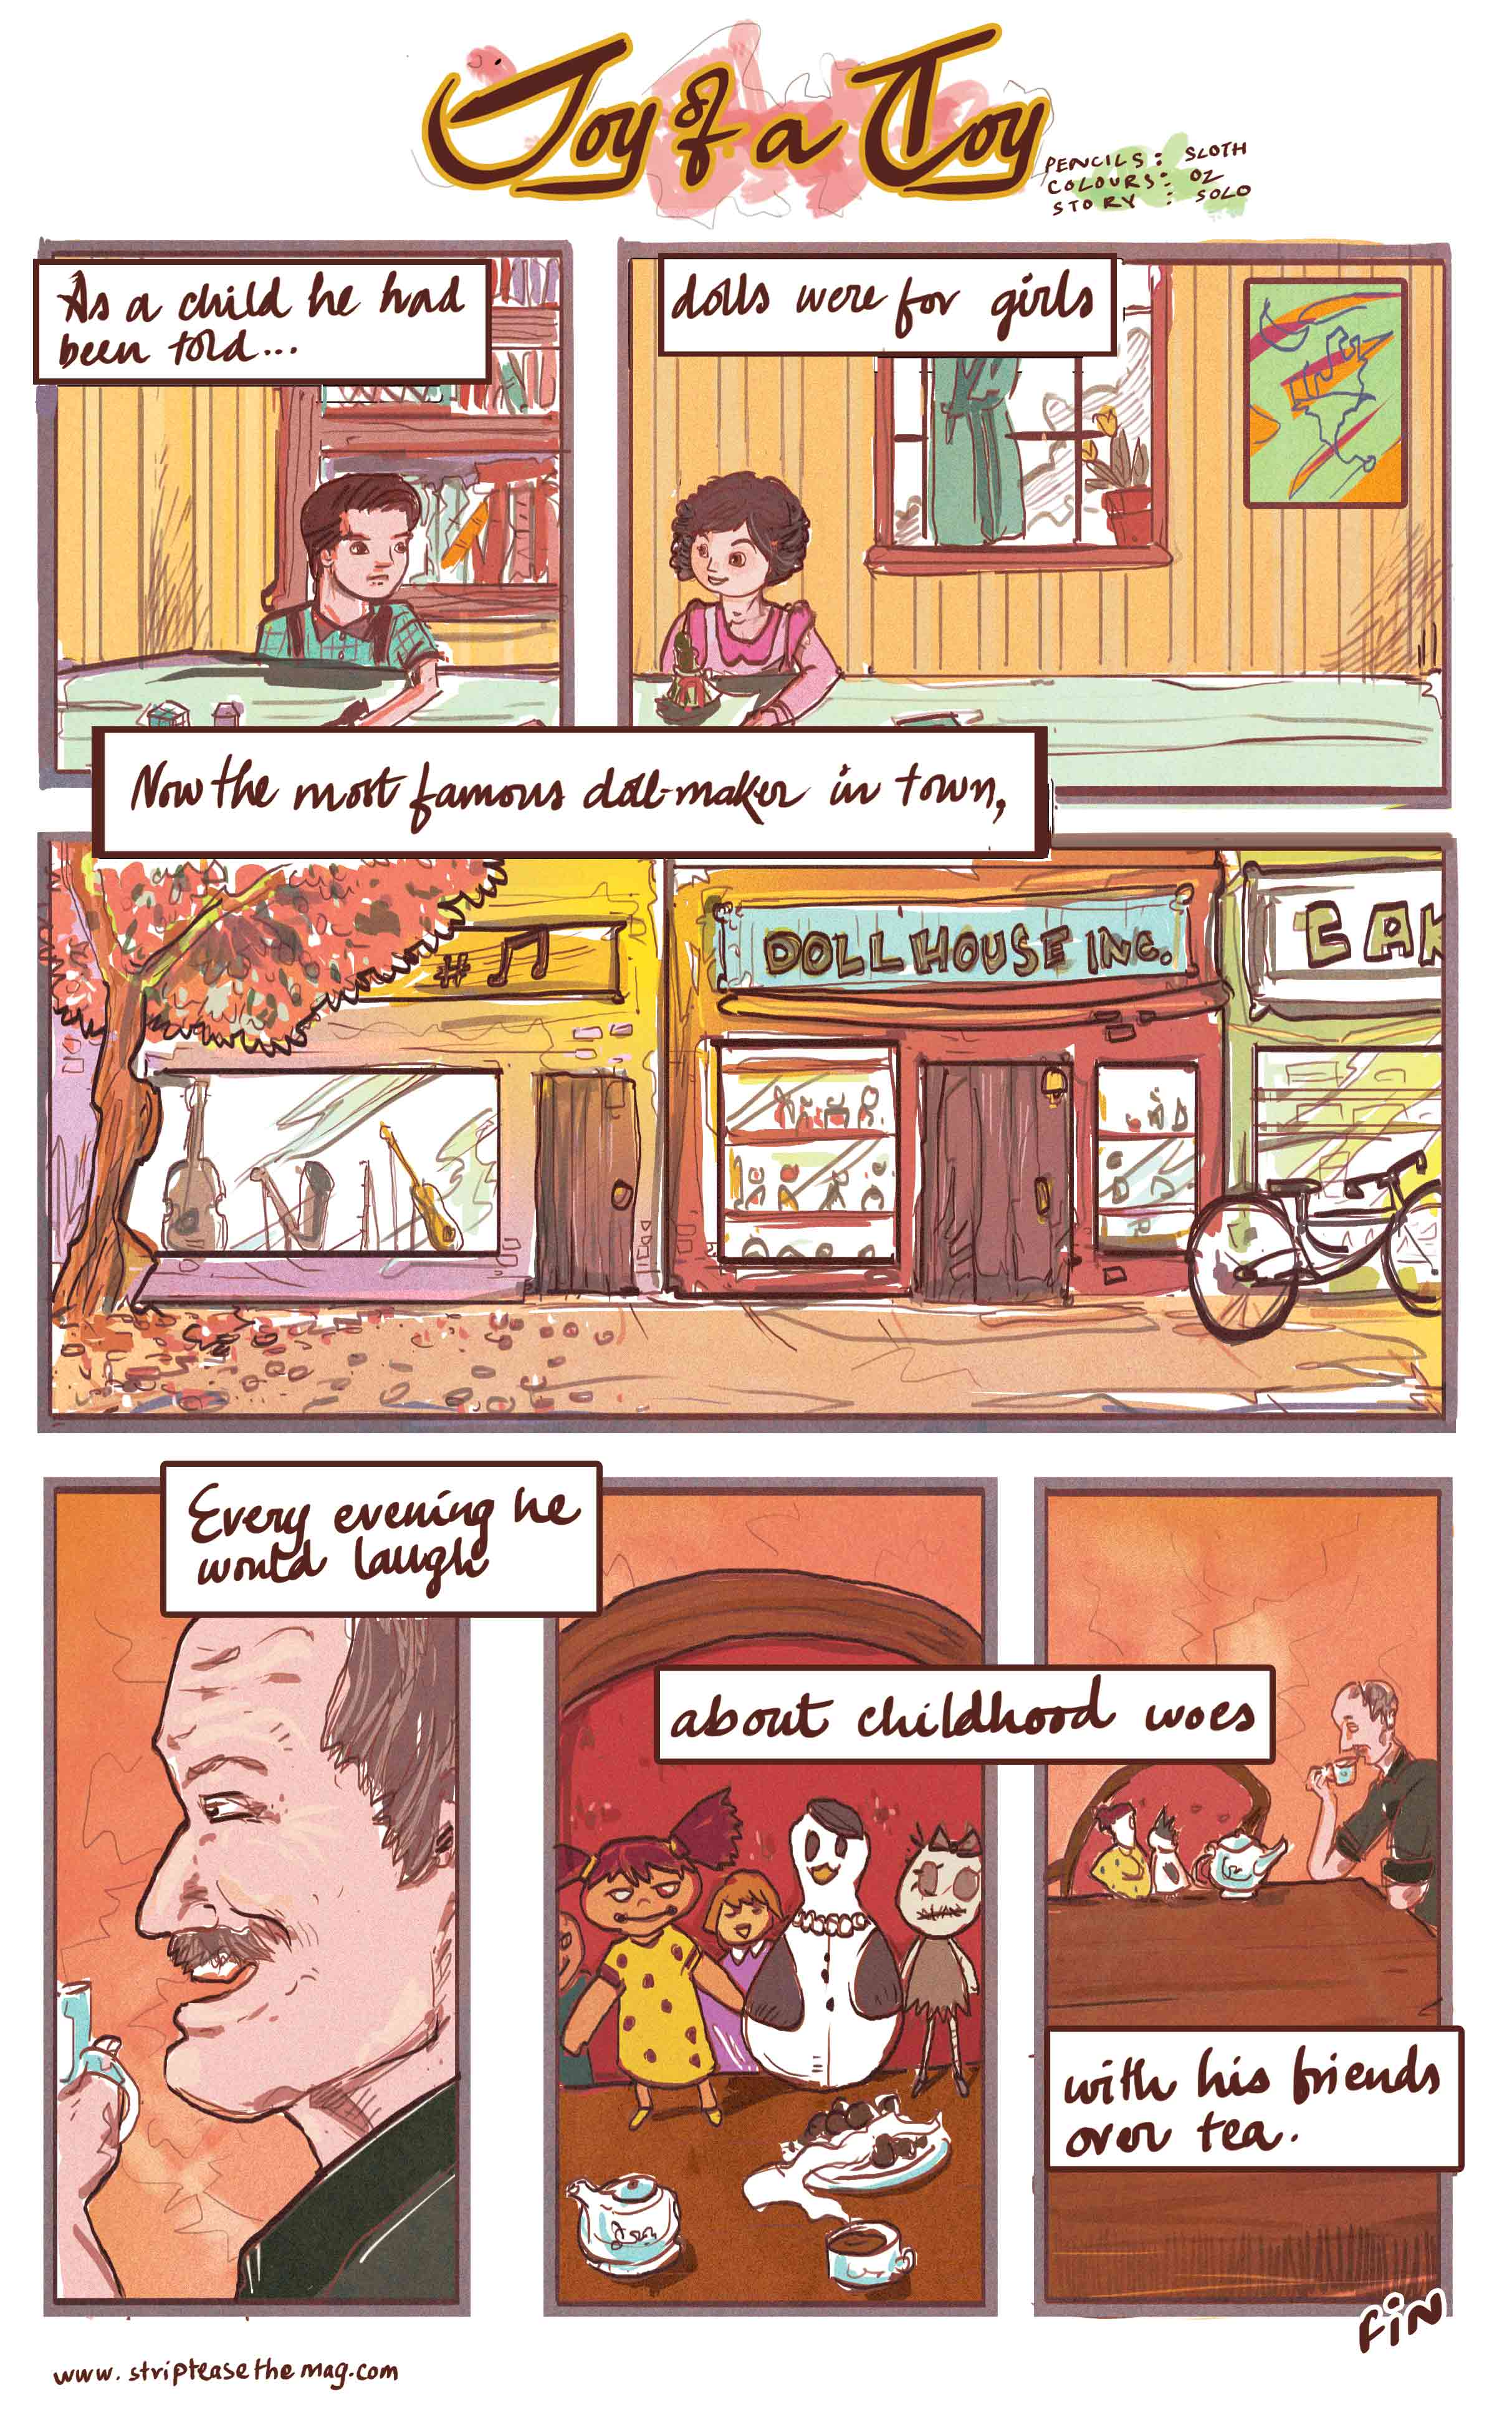 Sunday Comics 02 - Joy of a Toy